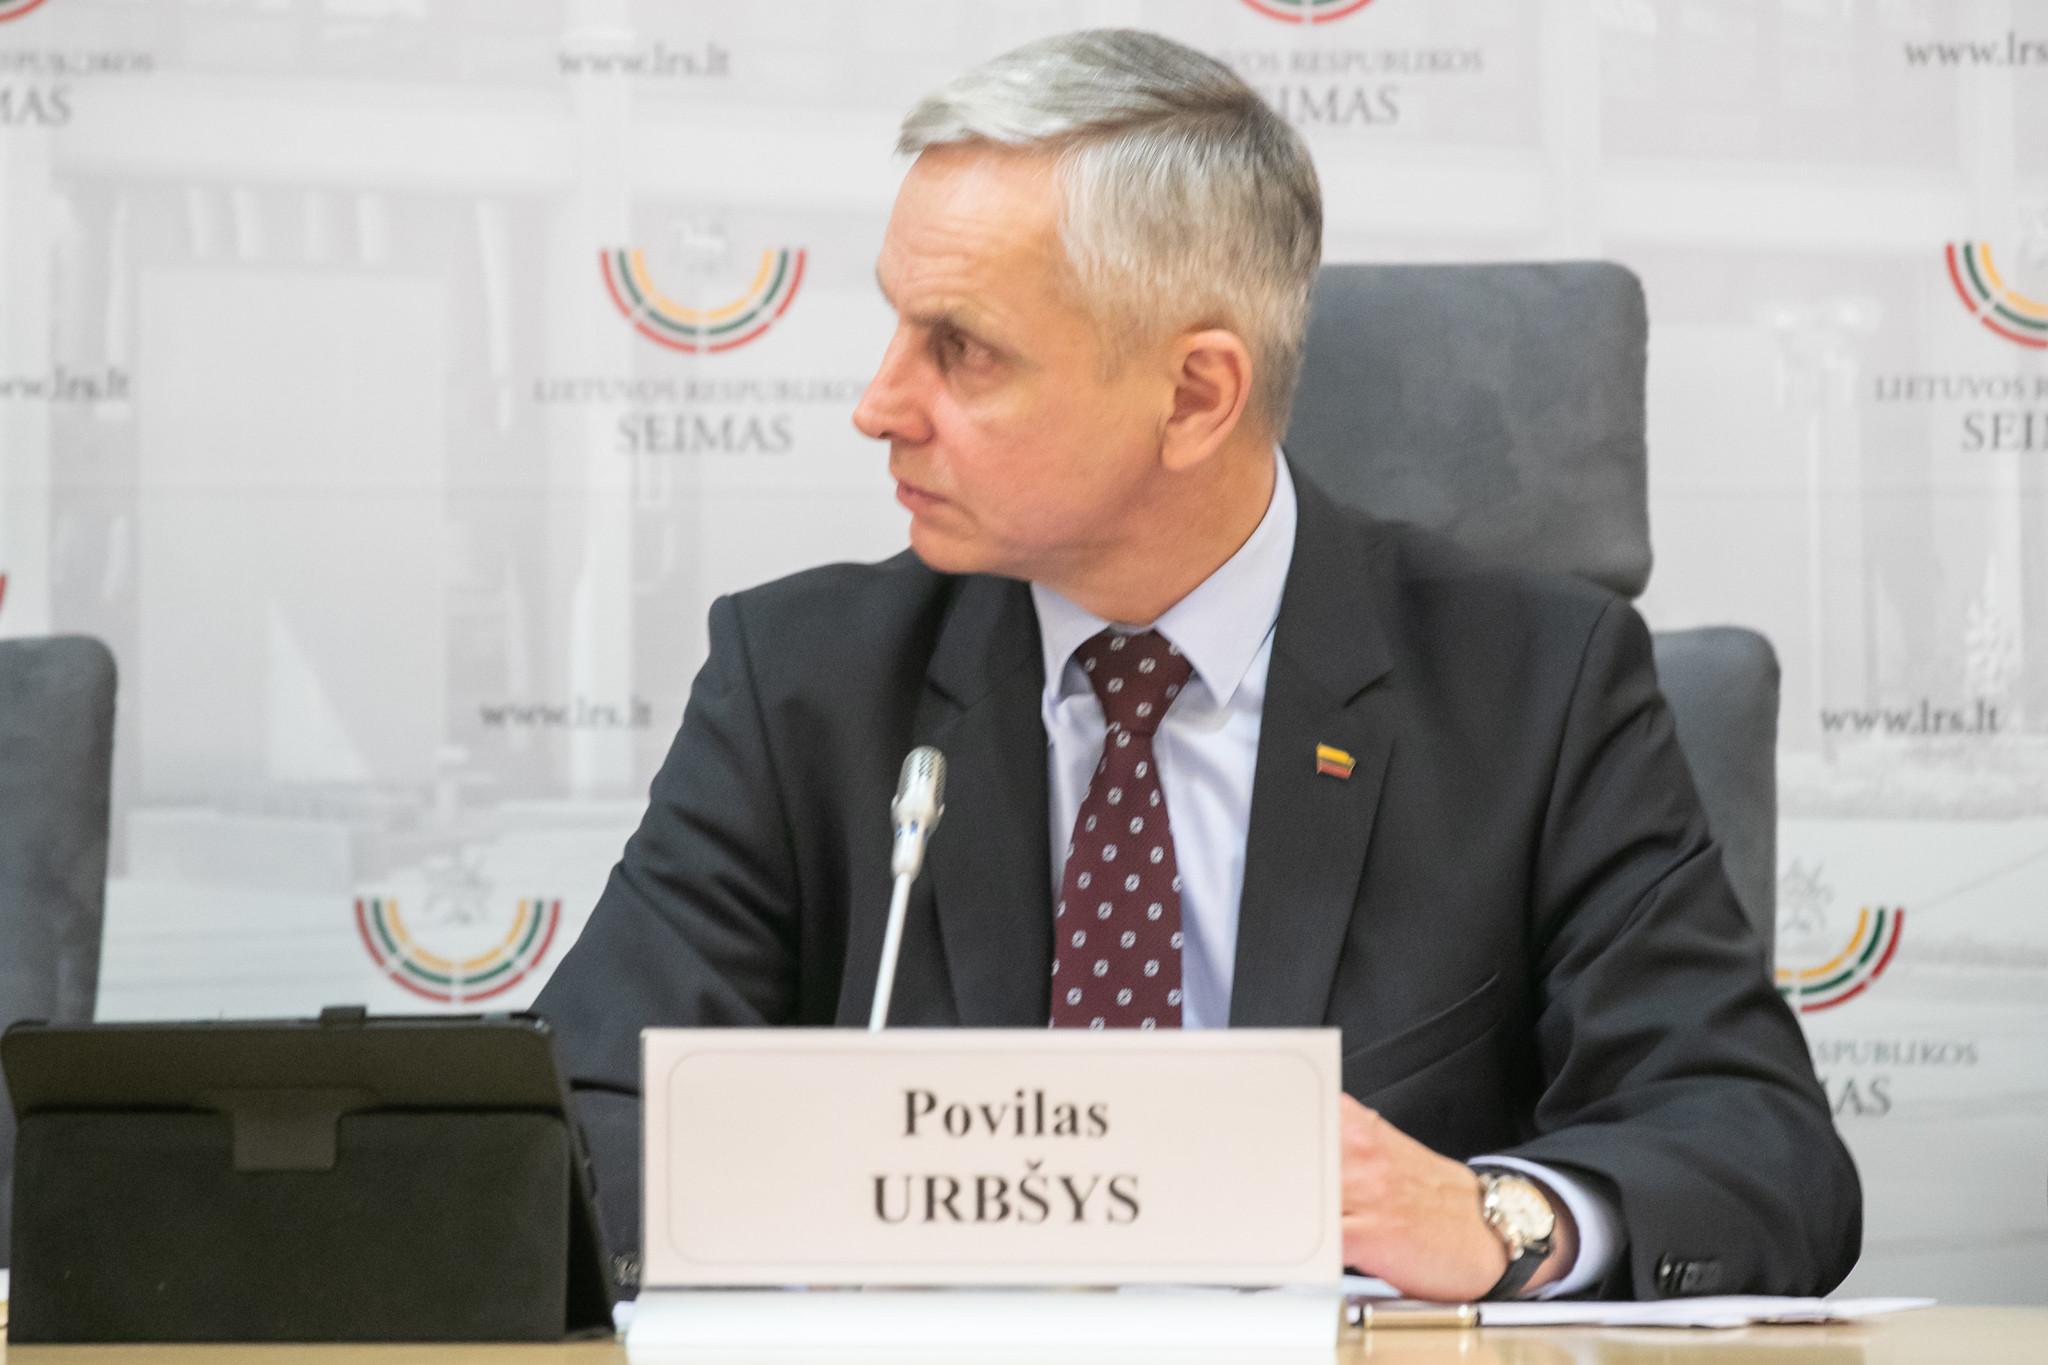 Povilas Urbšys | lrs.lt, Dž. G. Barysaitės nuotr.